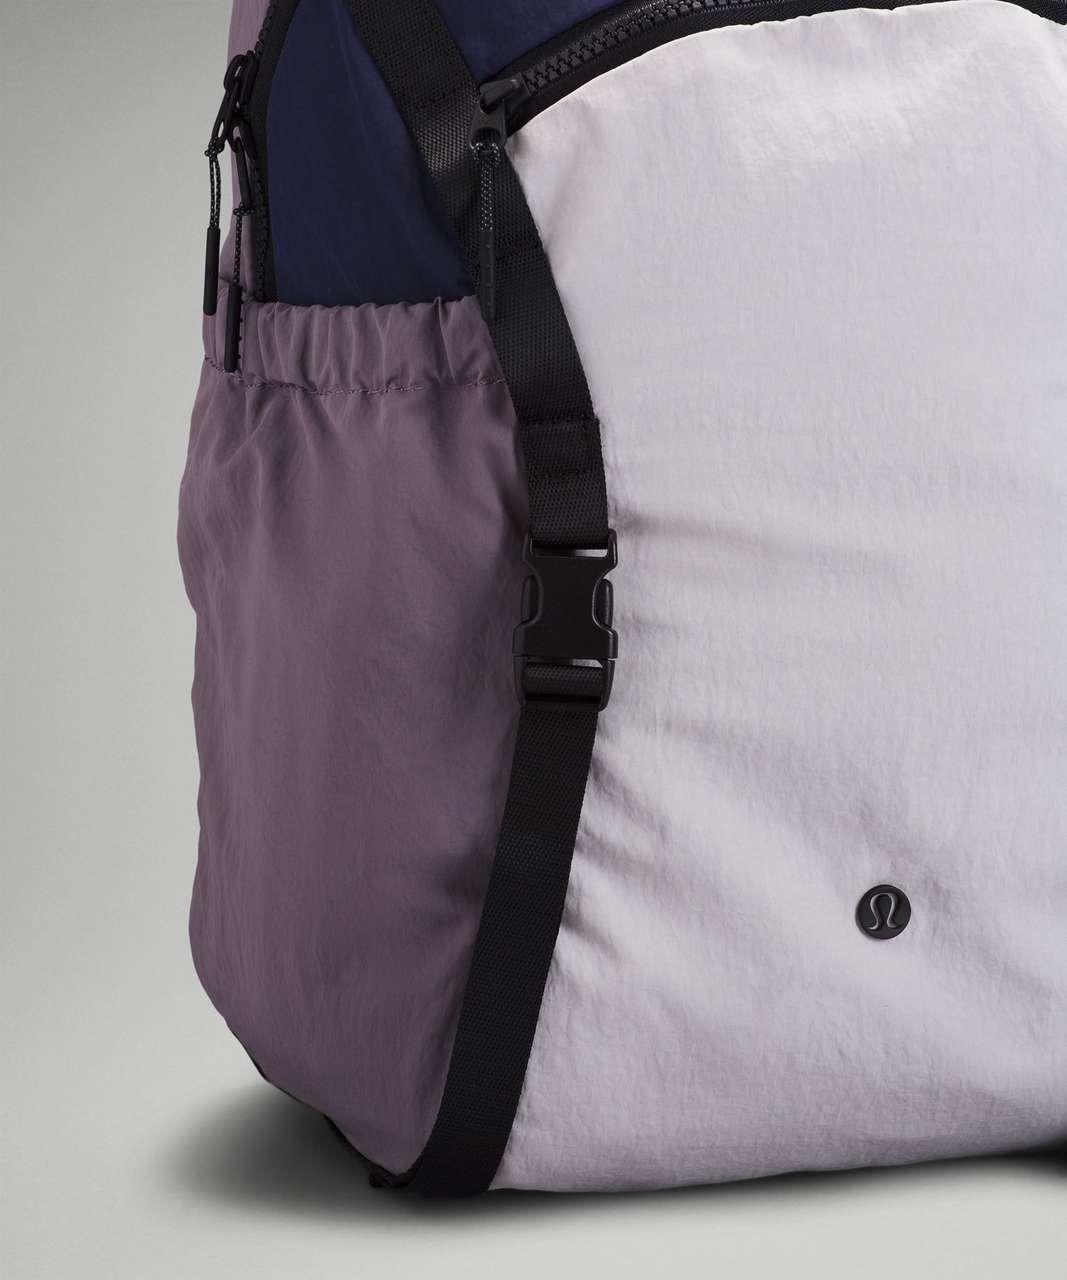 Lululemon Pack and Go Backpack 21L - Cadet Blue / Chrome / Dusky Lavender / Autumn Red